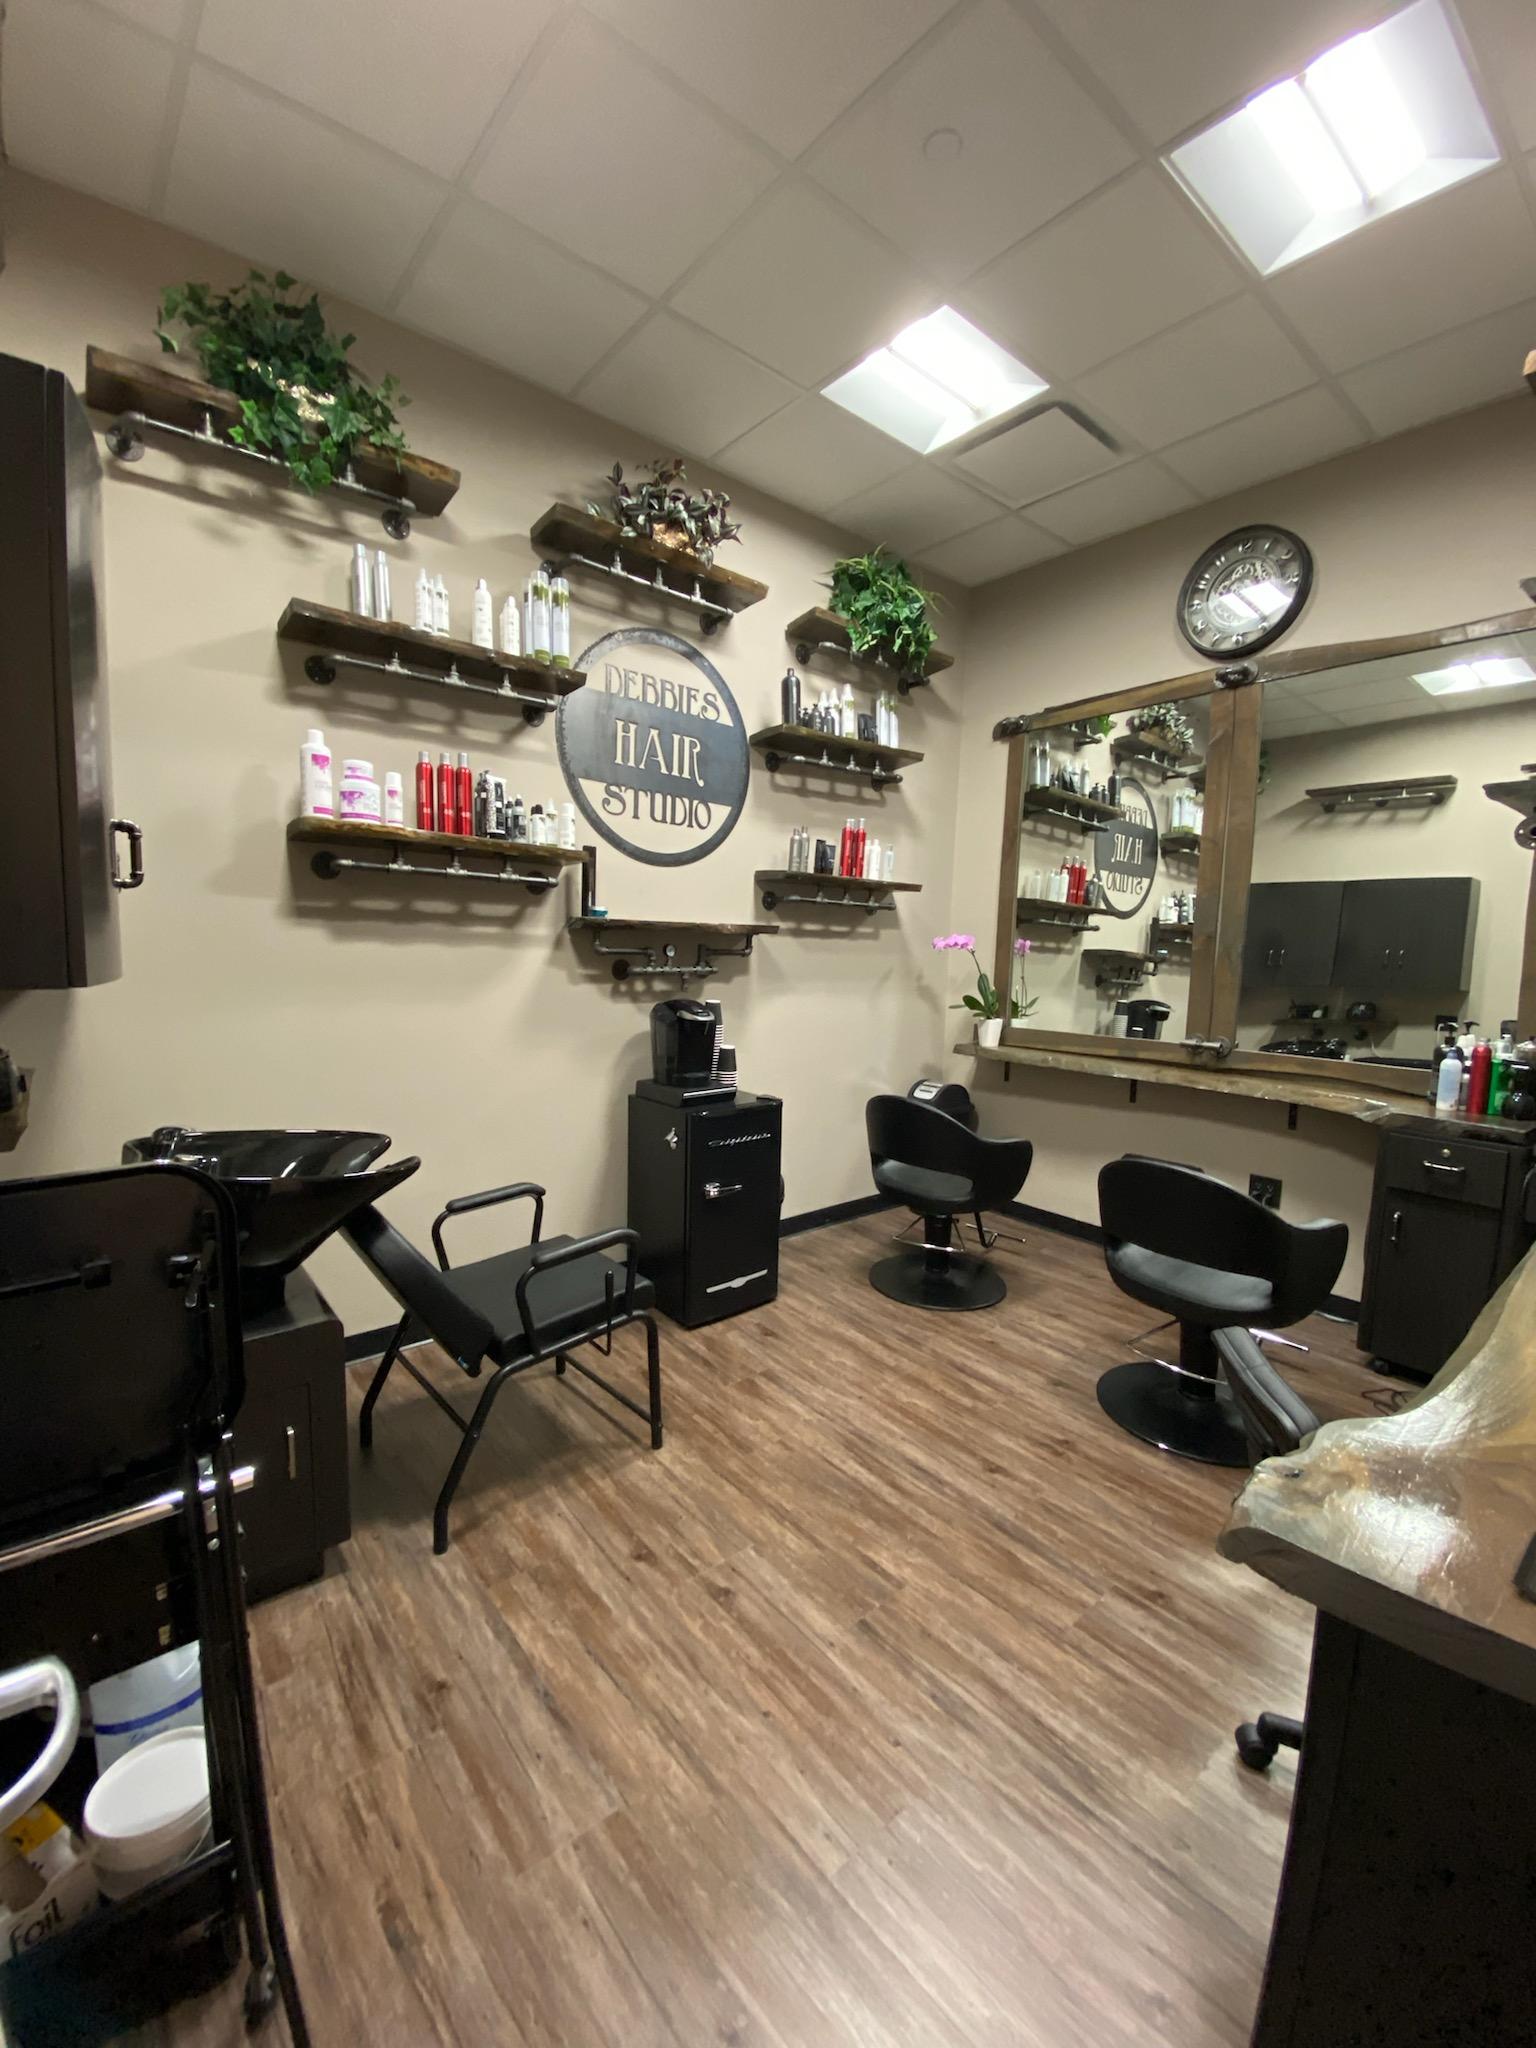 Leasing Salon Suites Watchung, NJ